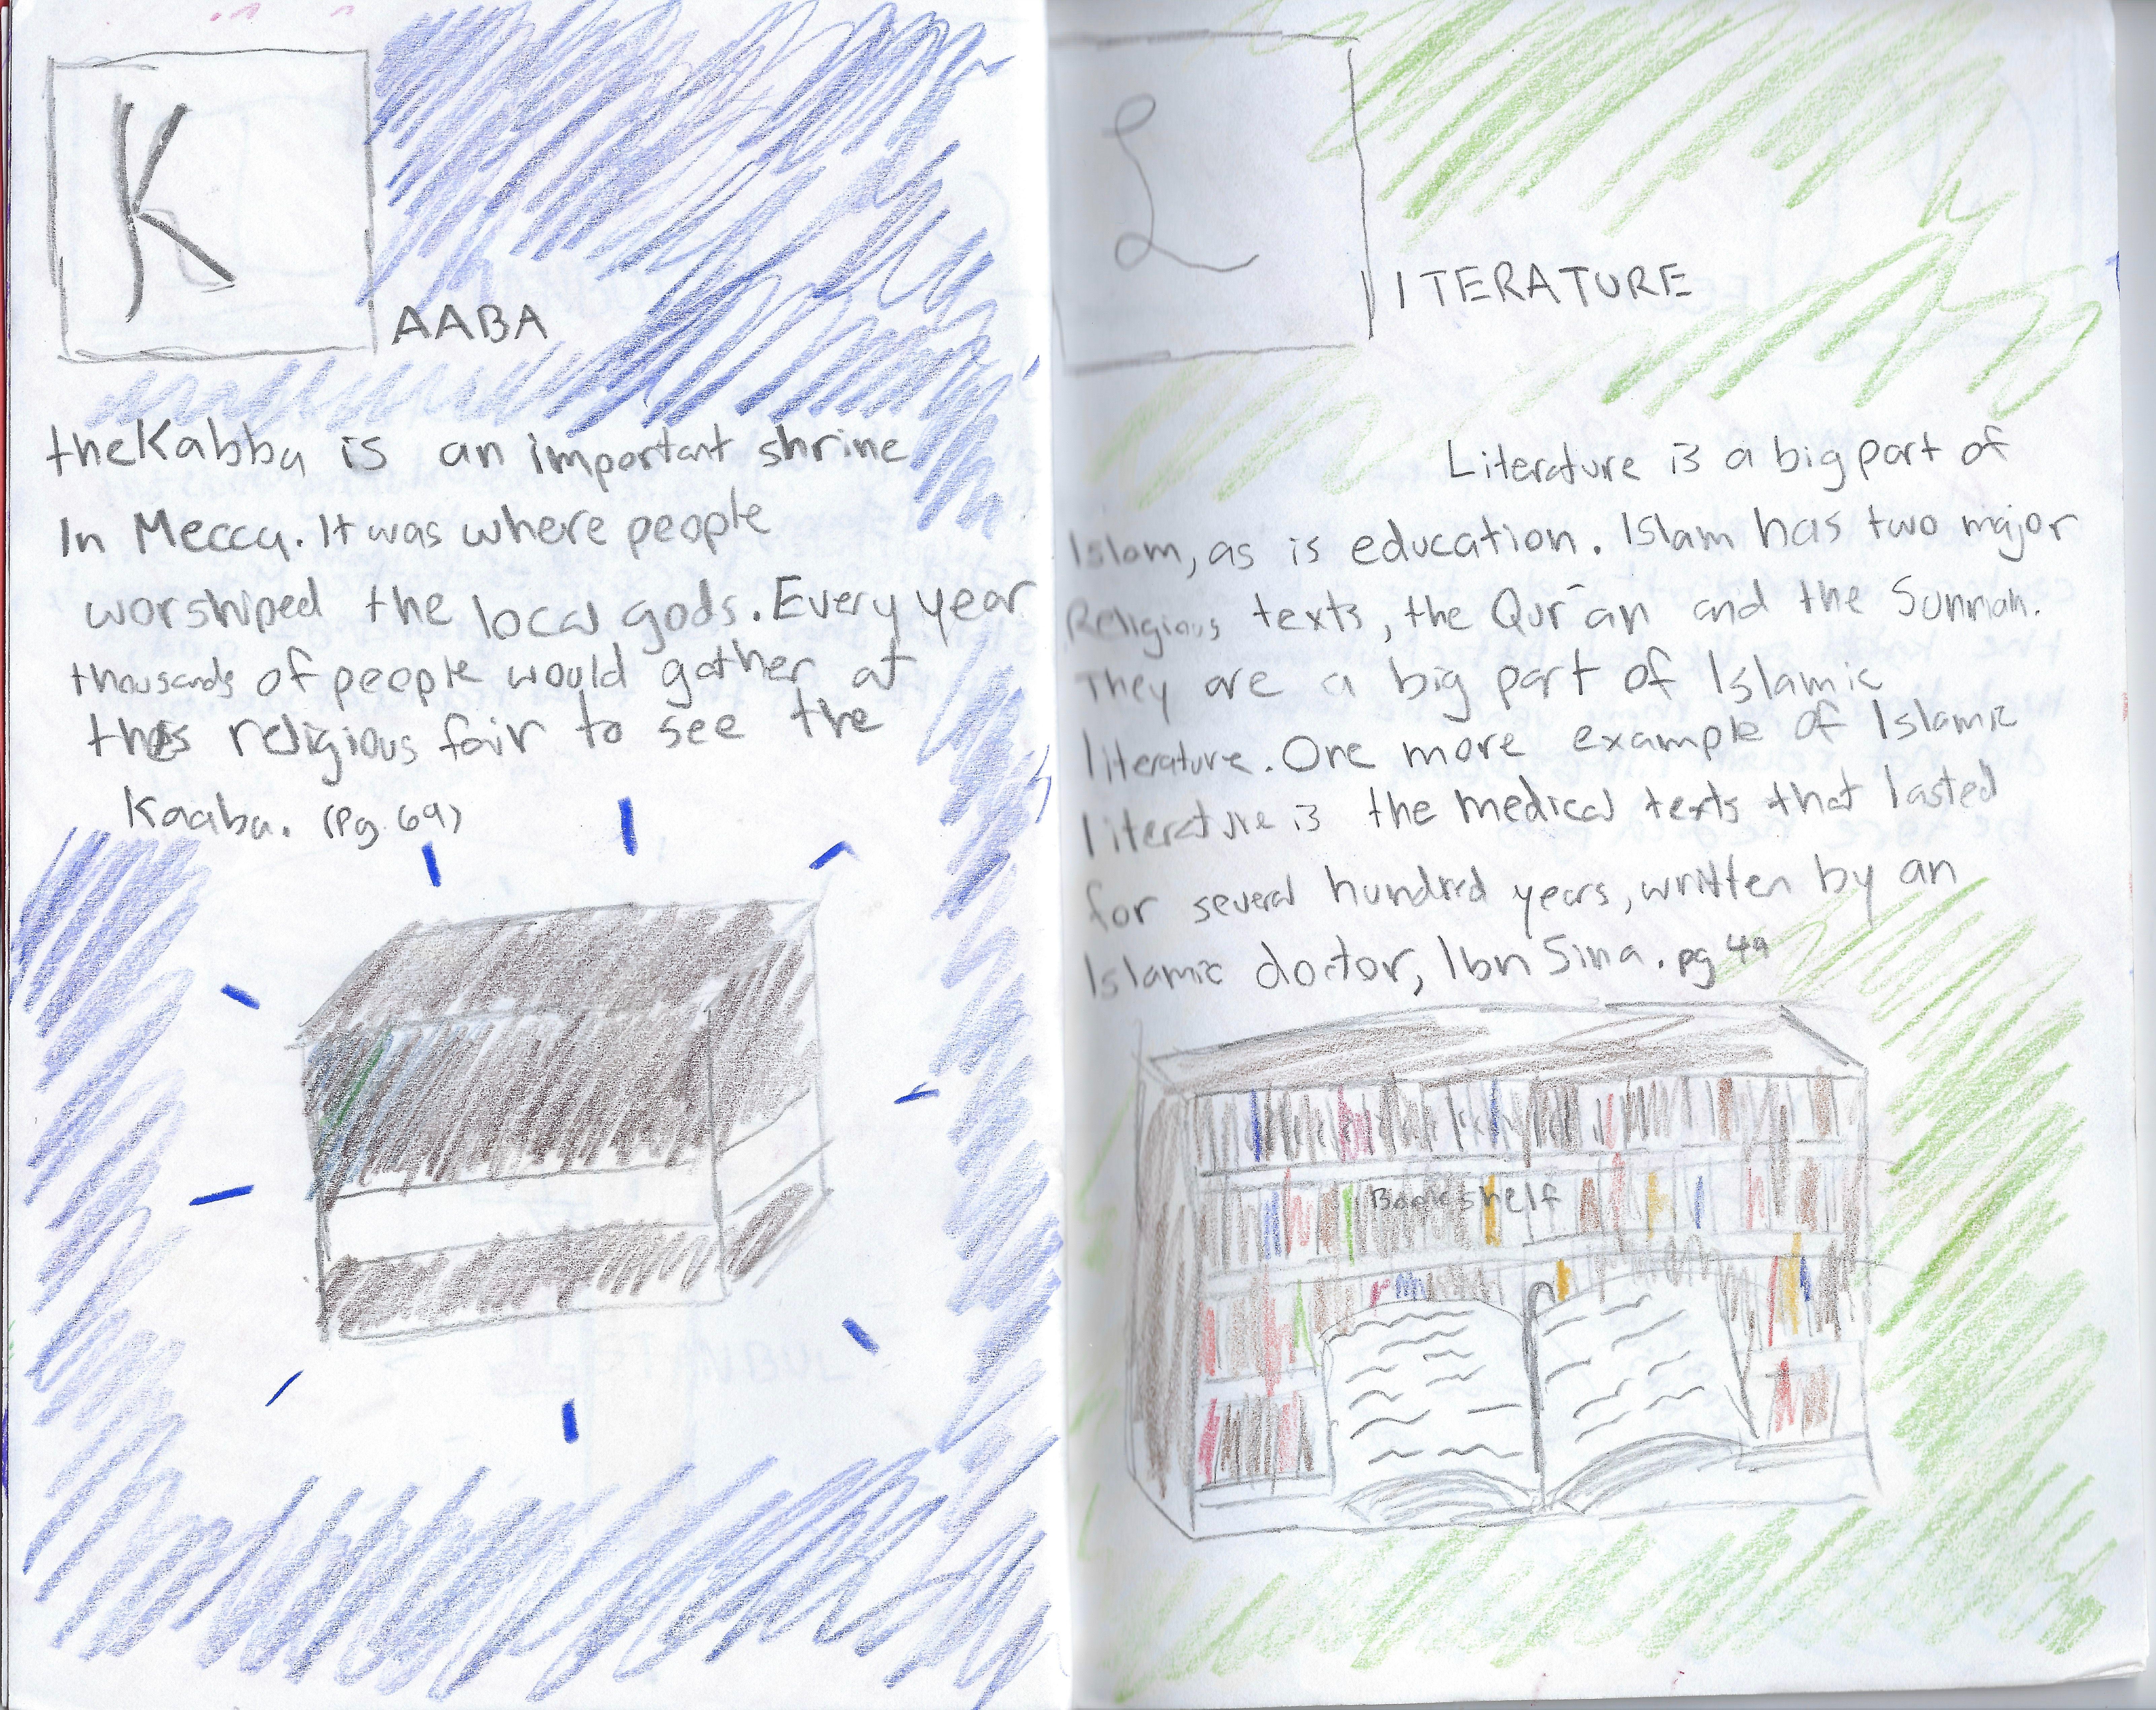 Sam 7th 8th Grade The Abcs Of Islam Abc Education Islam